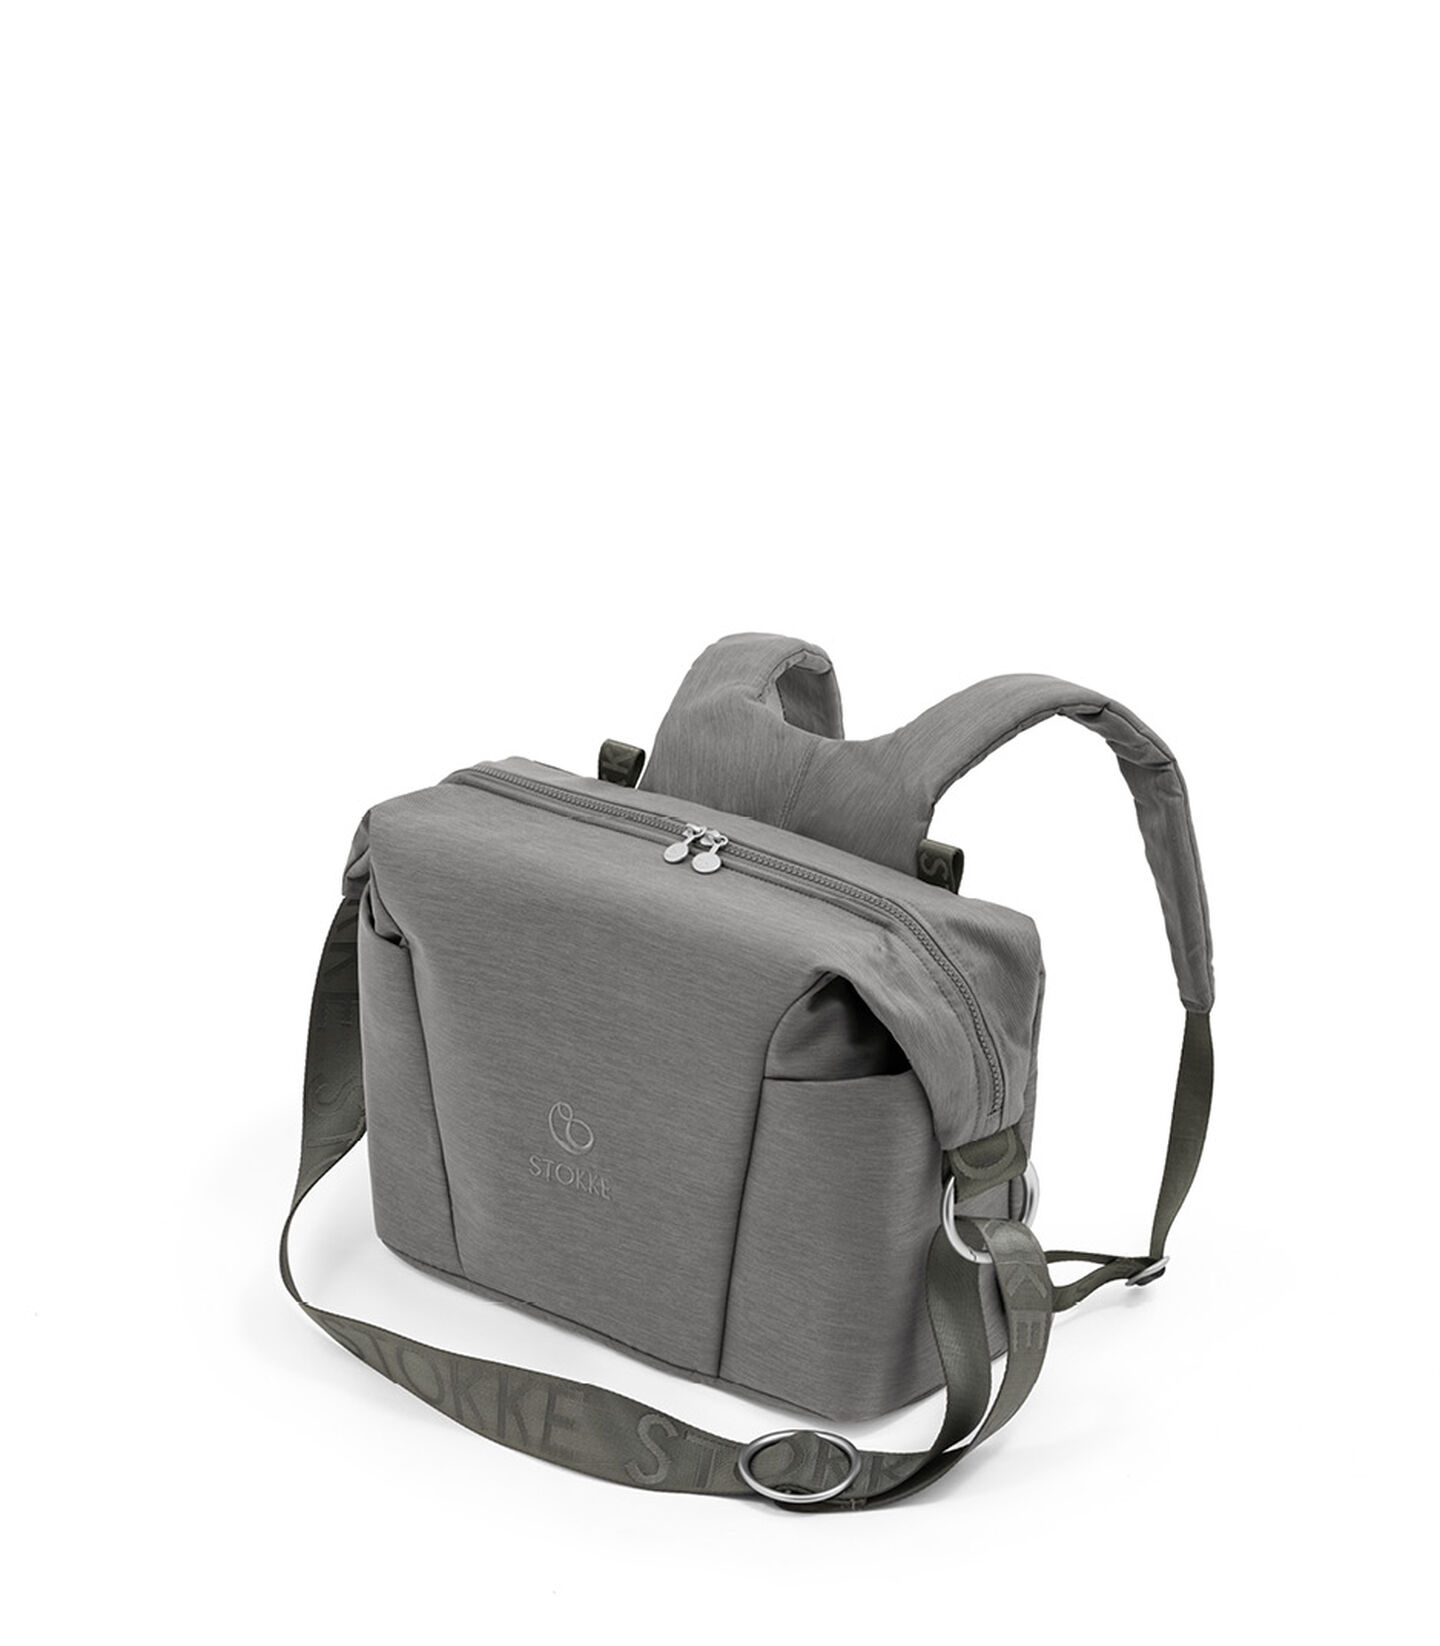 Stokke® Xplory® X Wickeltasche Modern Grey, Modern Grey, mainview view 1